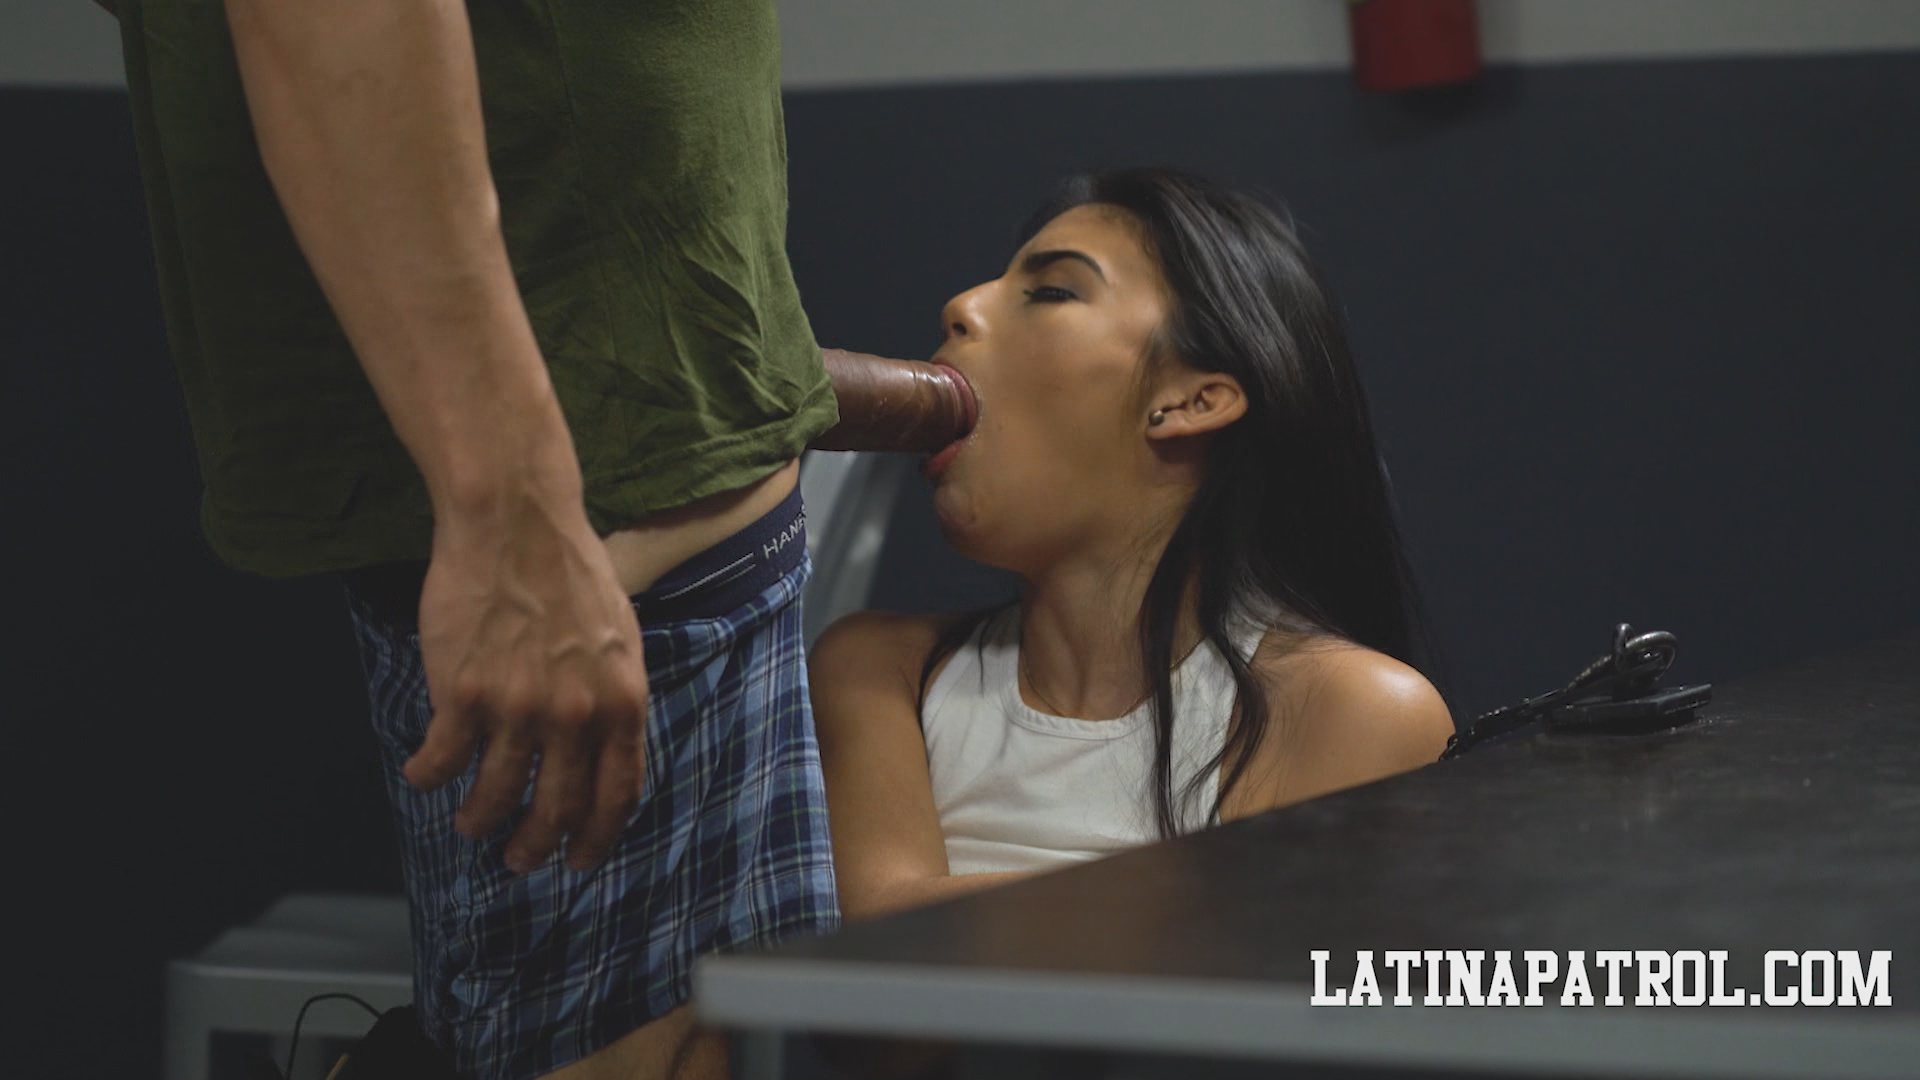 Latina Patrol: Michelle Martinez